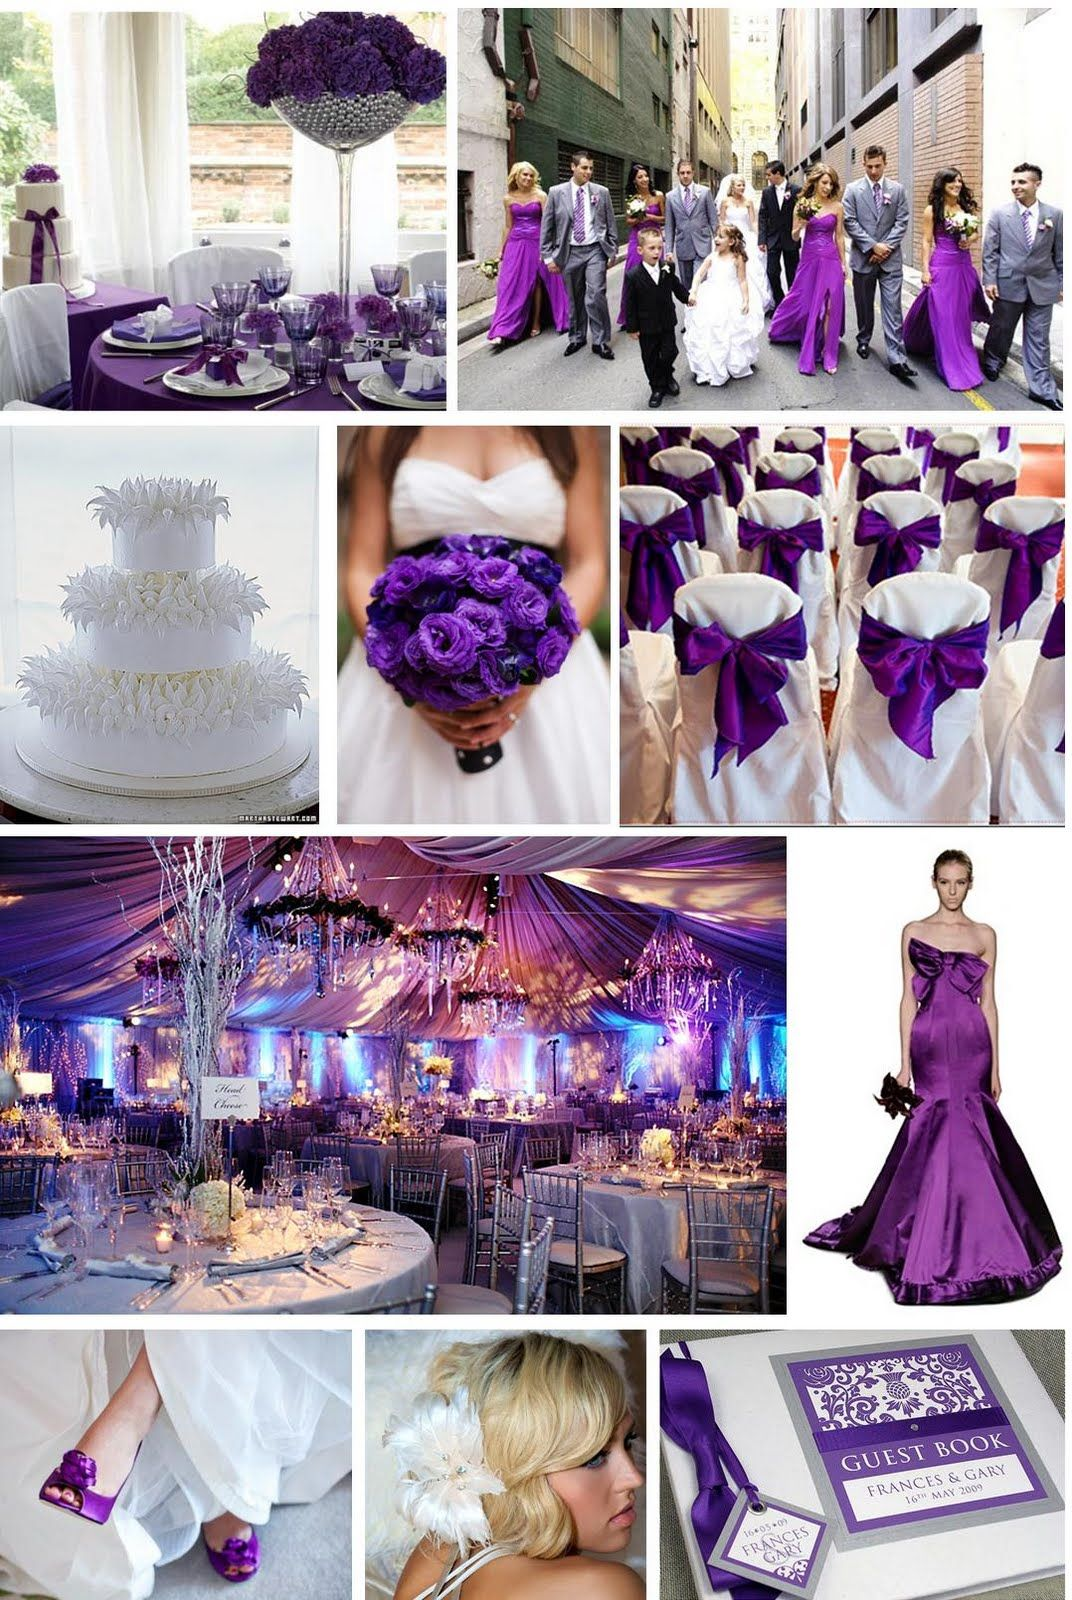 London Bridal Designer Sale Boda Purpura Boda Lila Boda